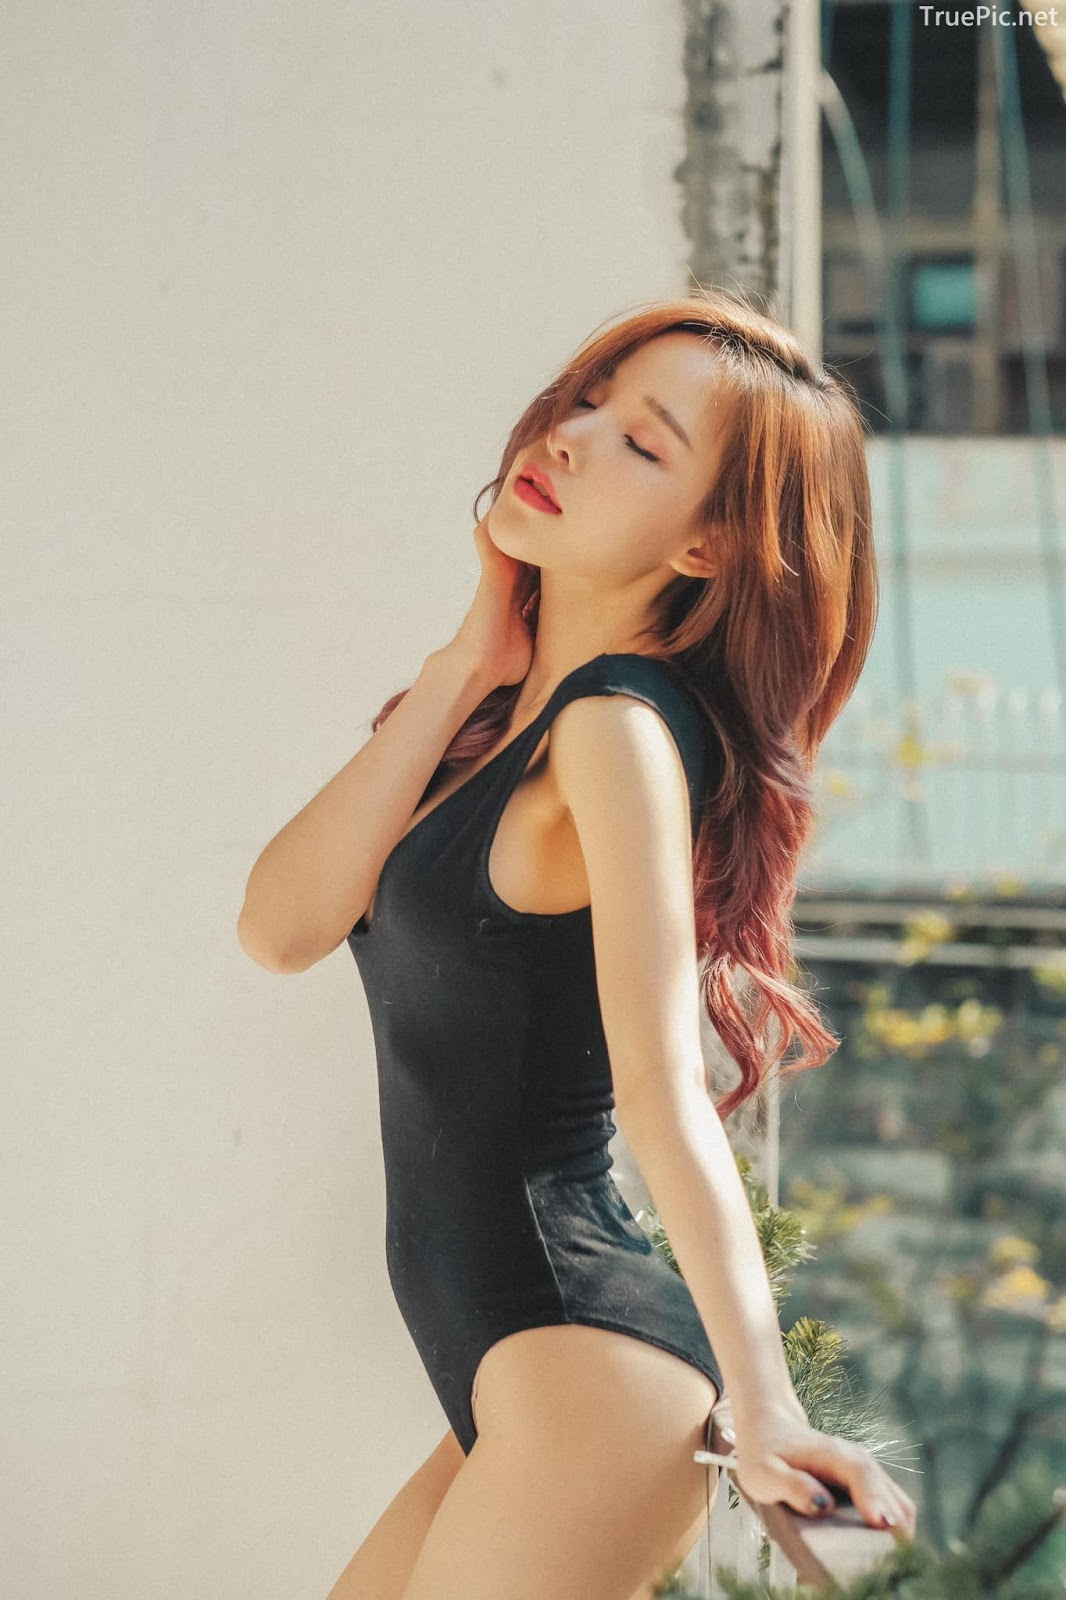 Thailand model - Arys Nam-in (Arysiacara) - Black Rose feeling the sun - Picture 4